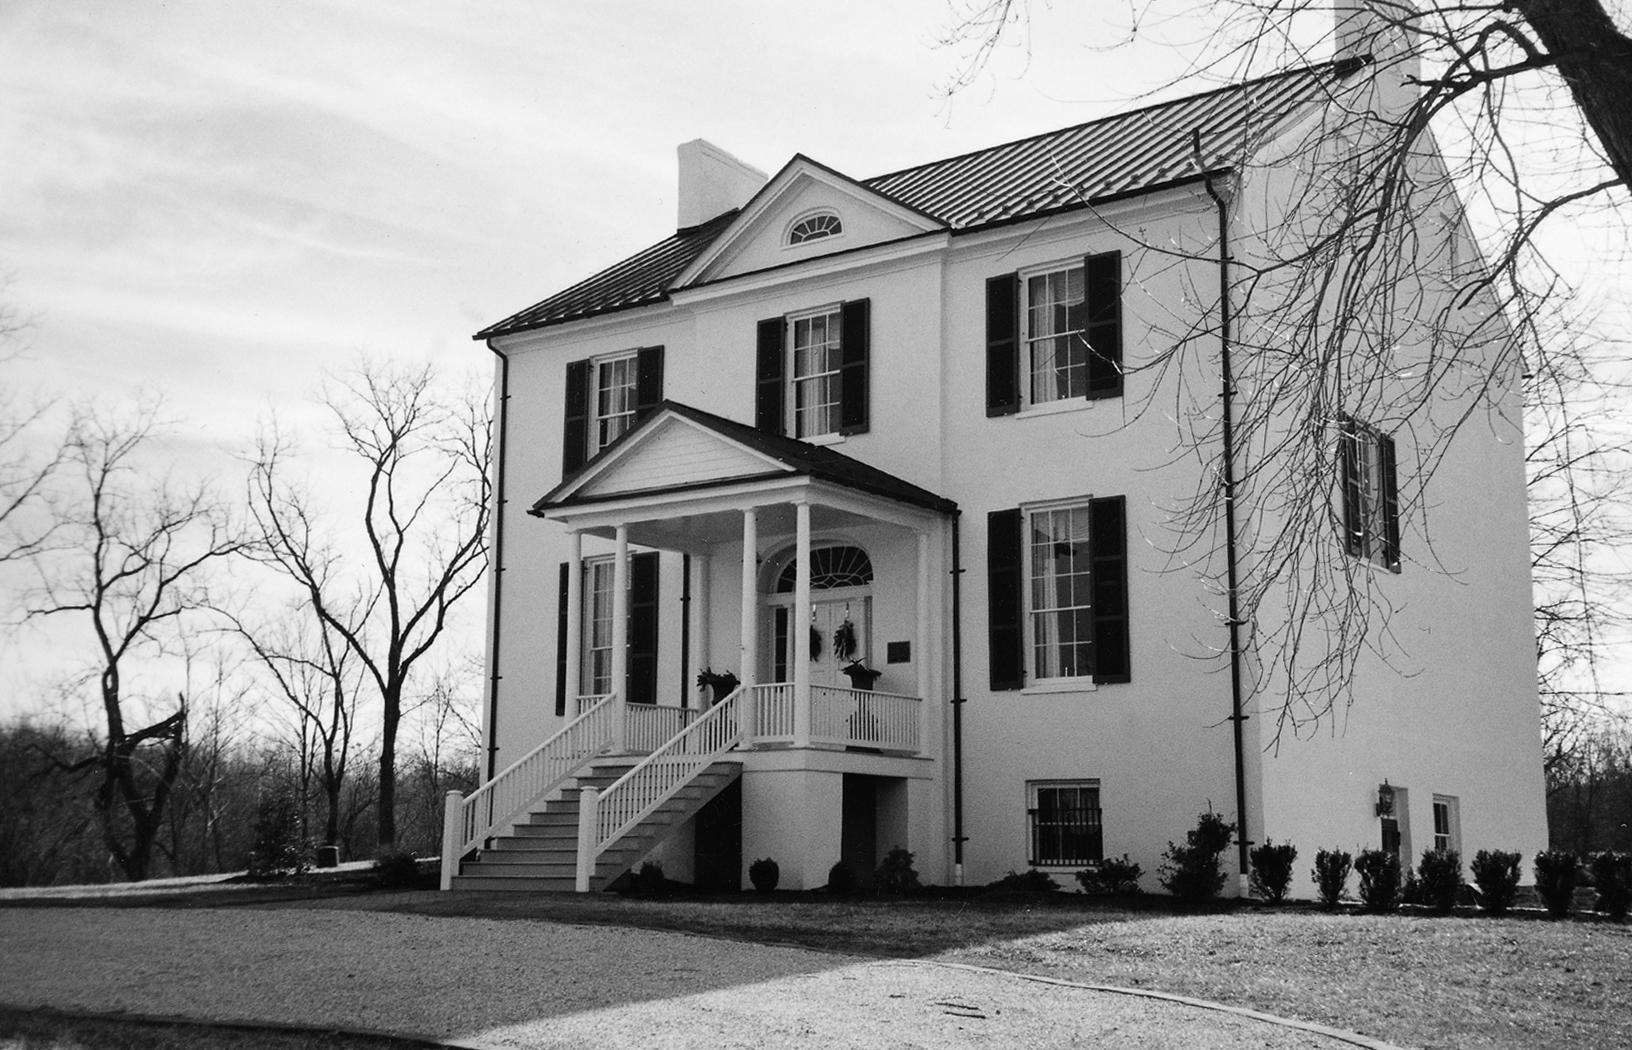 Architectural and Historic Homes of Washington County, Maryland, Woburn Manor